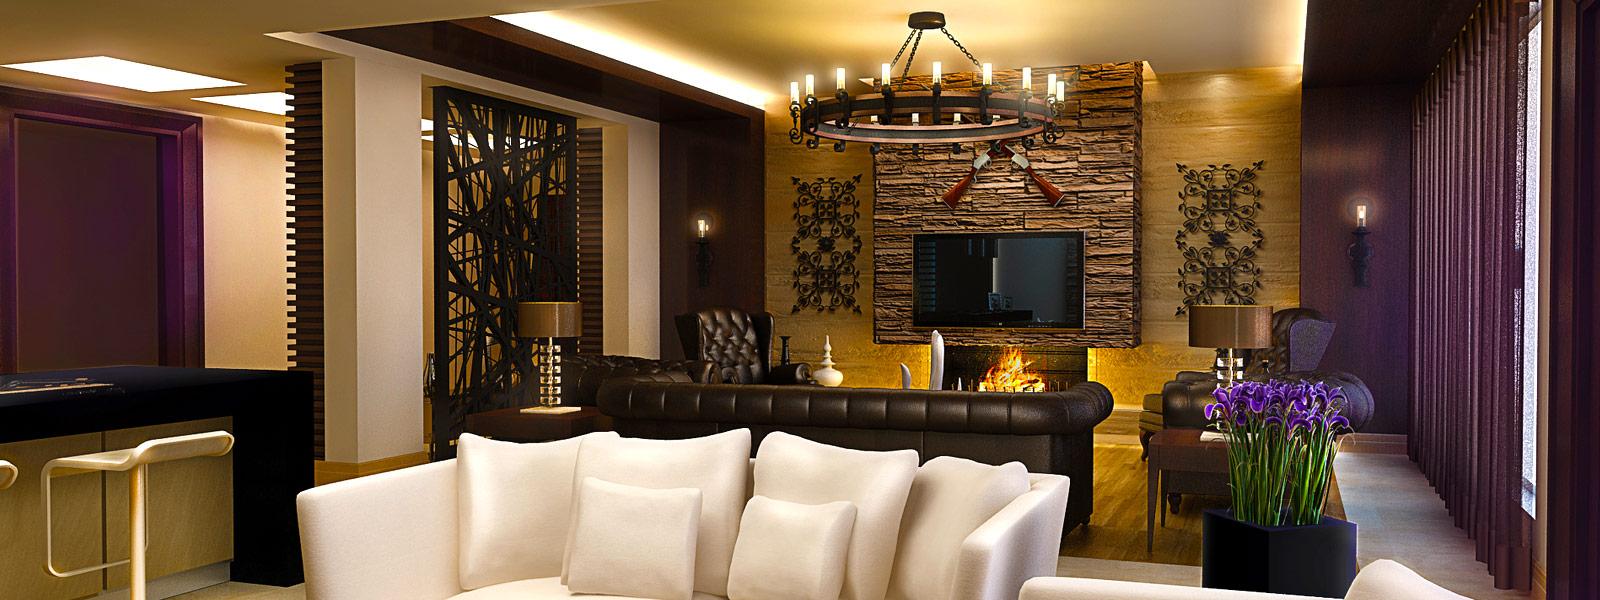 Magnificent Interior Landscape Designs Extensive Knowledge Luxury Decorations